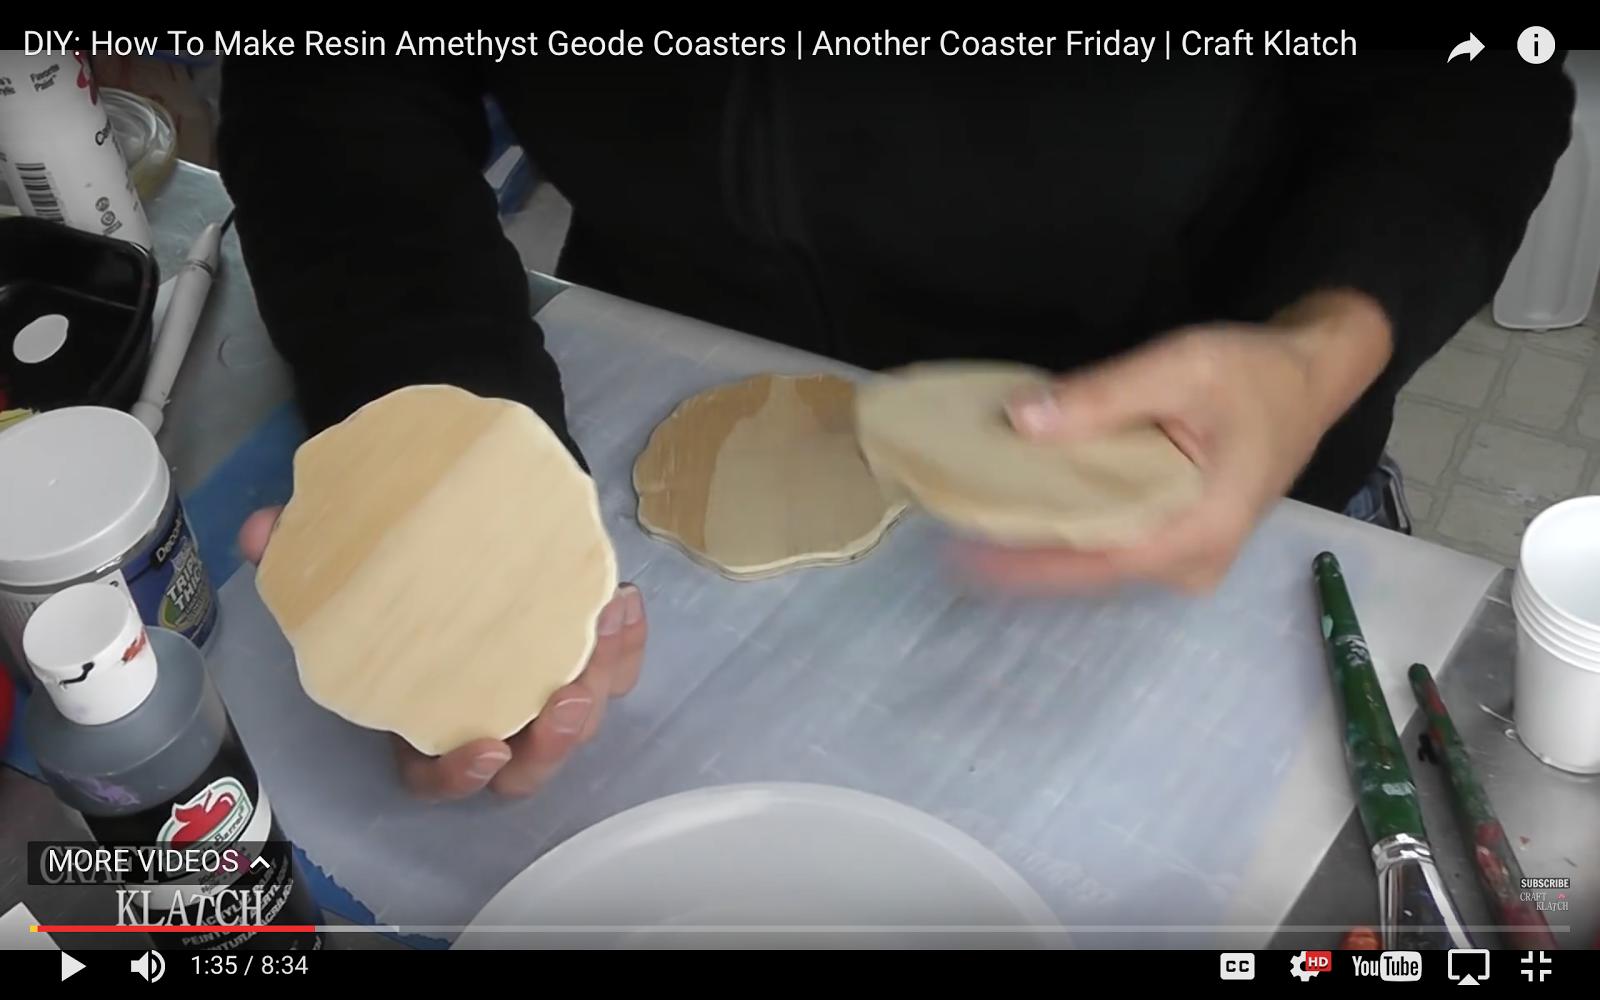 Craft Klatch 174 Diy How To Make Resin Geode Coasters